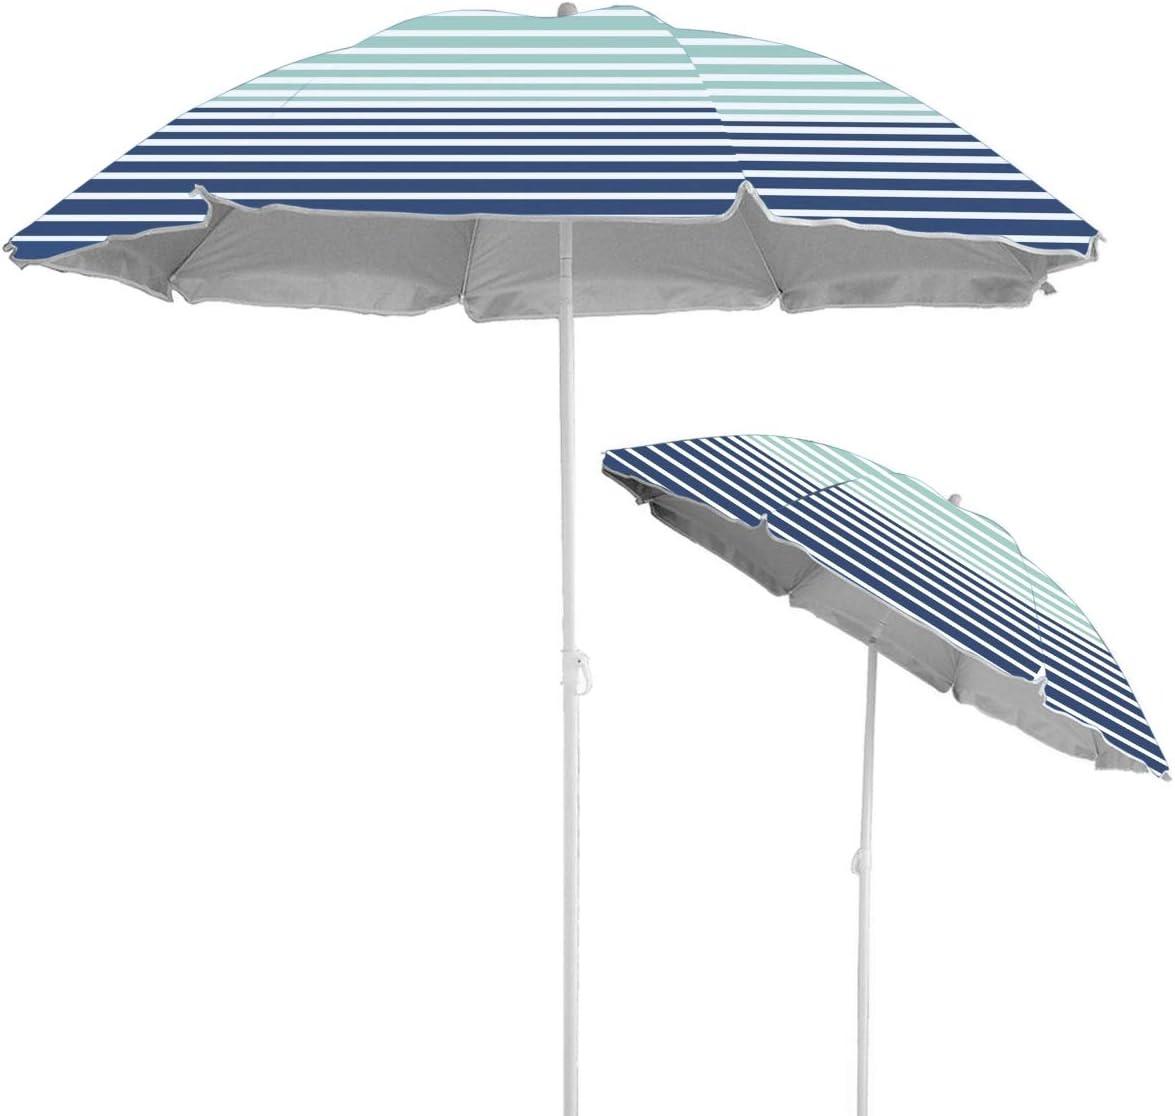 Caribbean Joe Chaby International Portable, Adjustable Tilt Beach Umbrella with UV Protection | Vented Canopy, Built-in Sand Screw Anchor, Carry Bag | 6 FT (Horizon Stripe) (CJ-UV72HS)